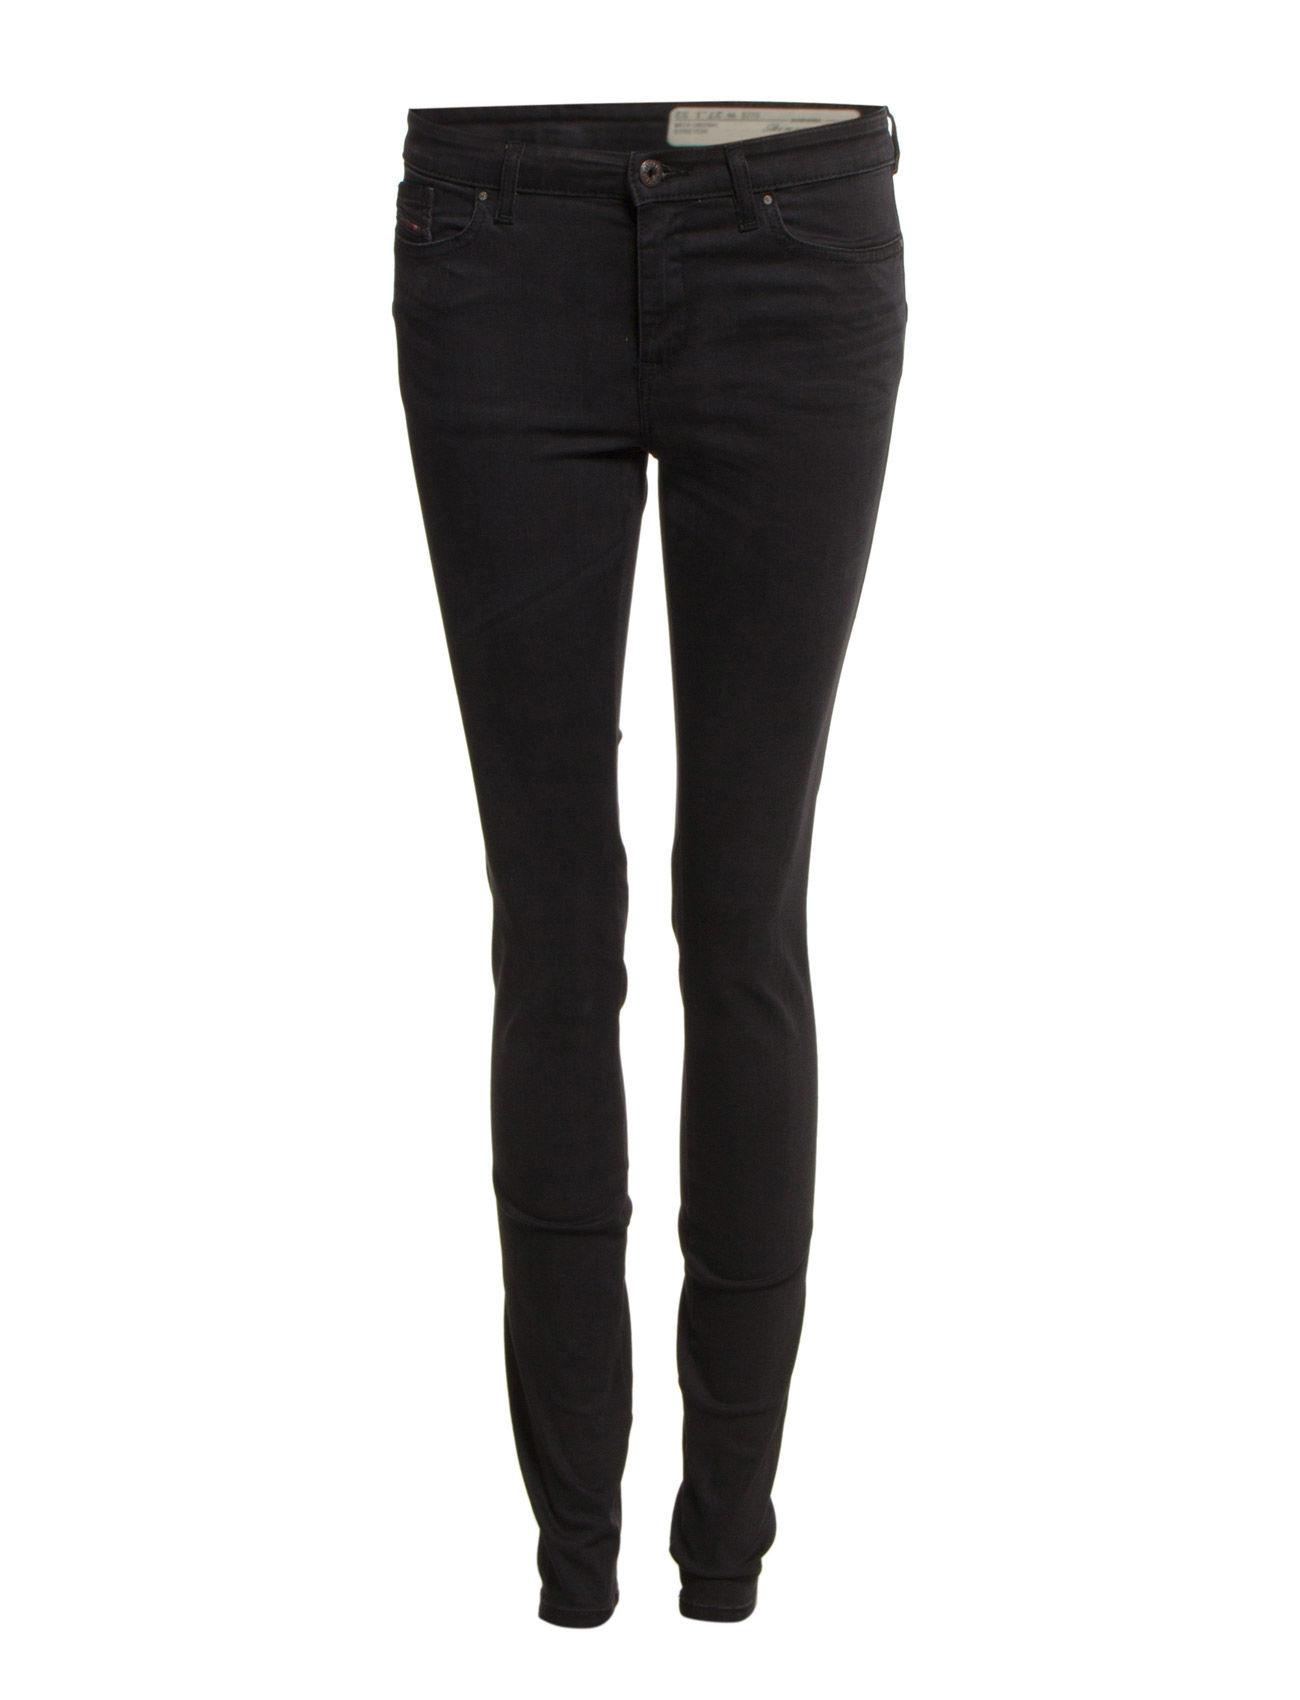 Skinzee-Dee L.32 Trousers